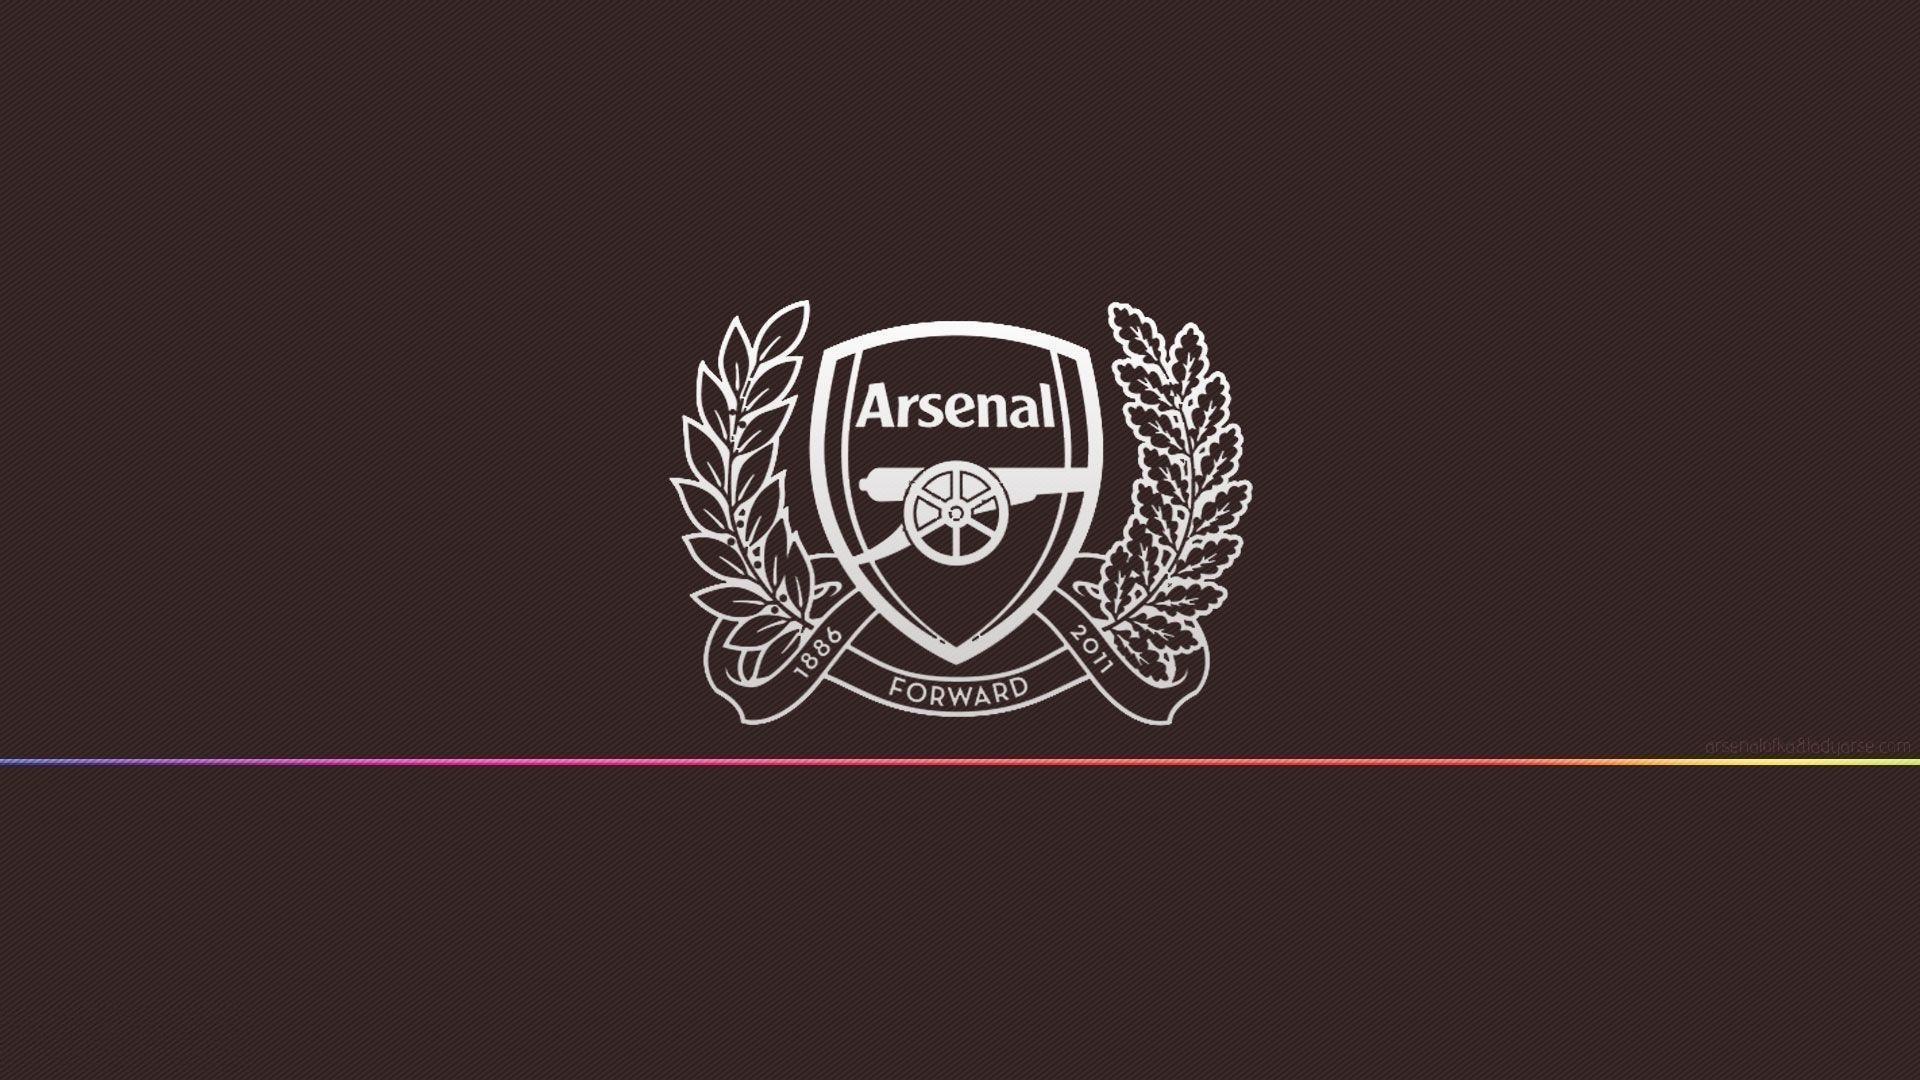 wallpapers arsenal 2021 football